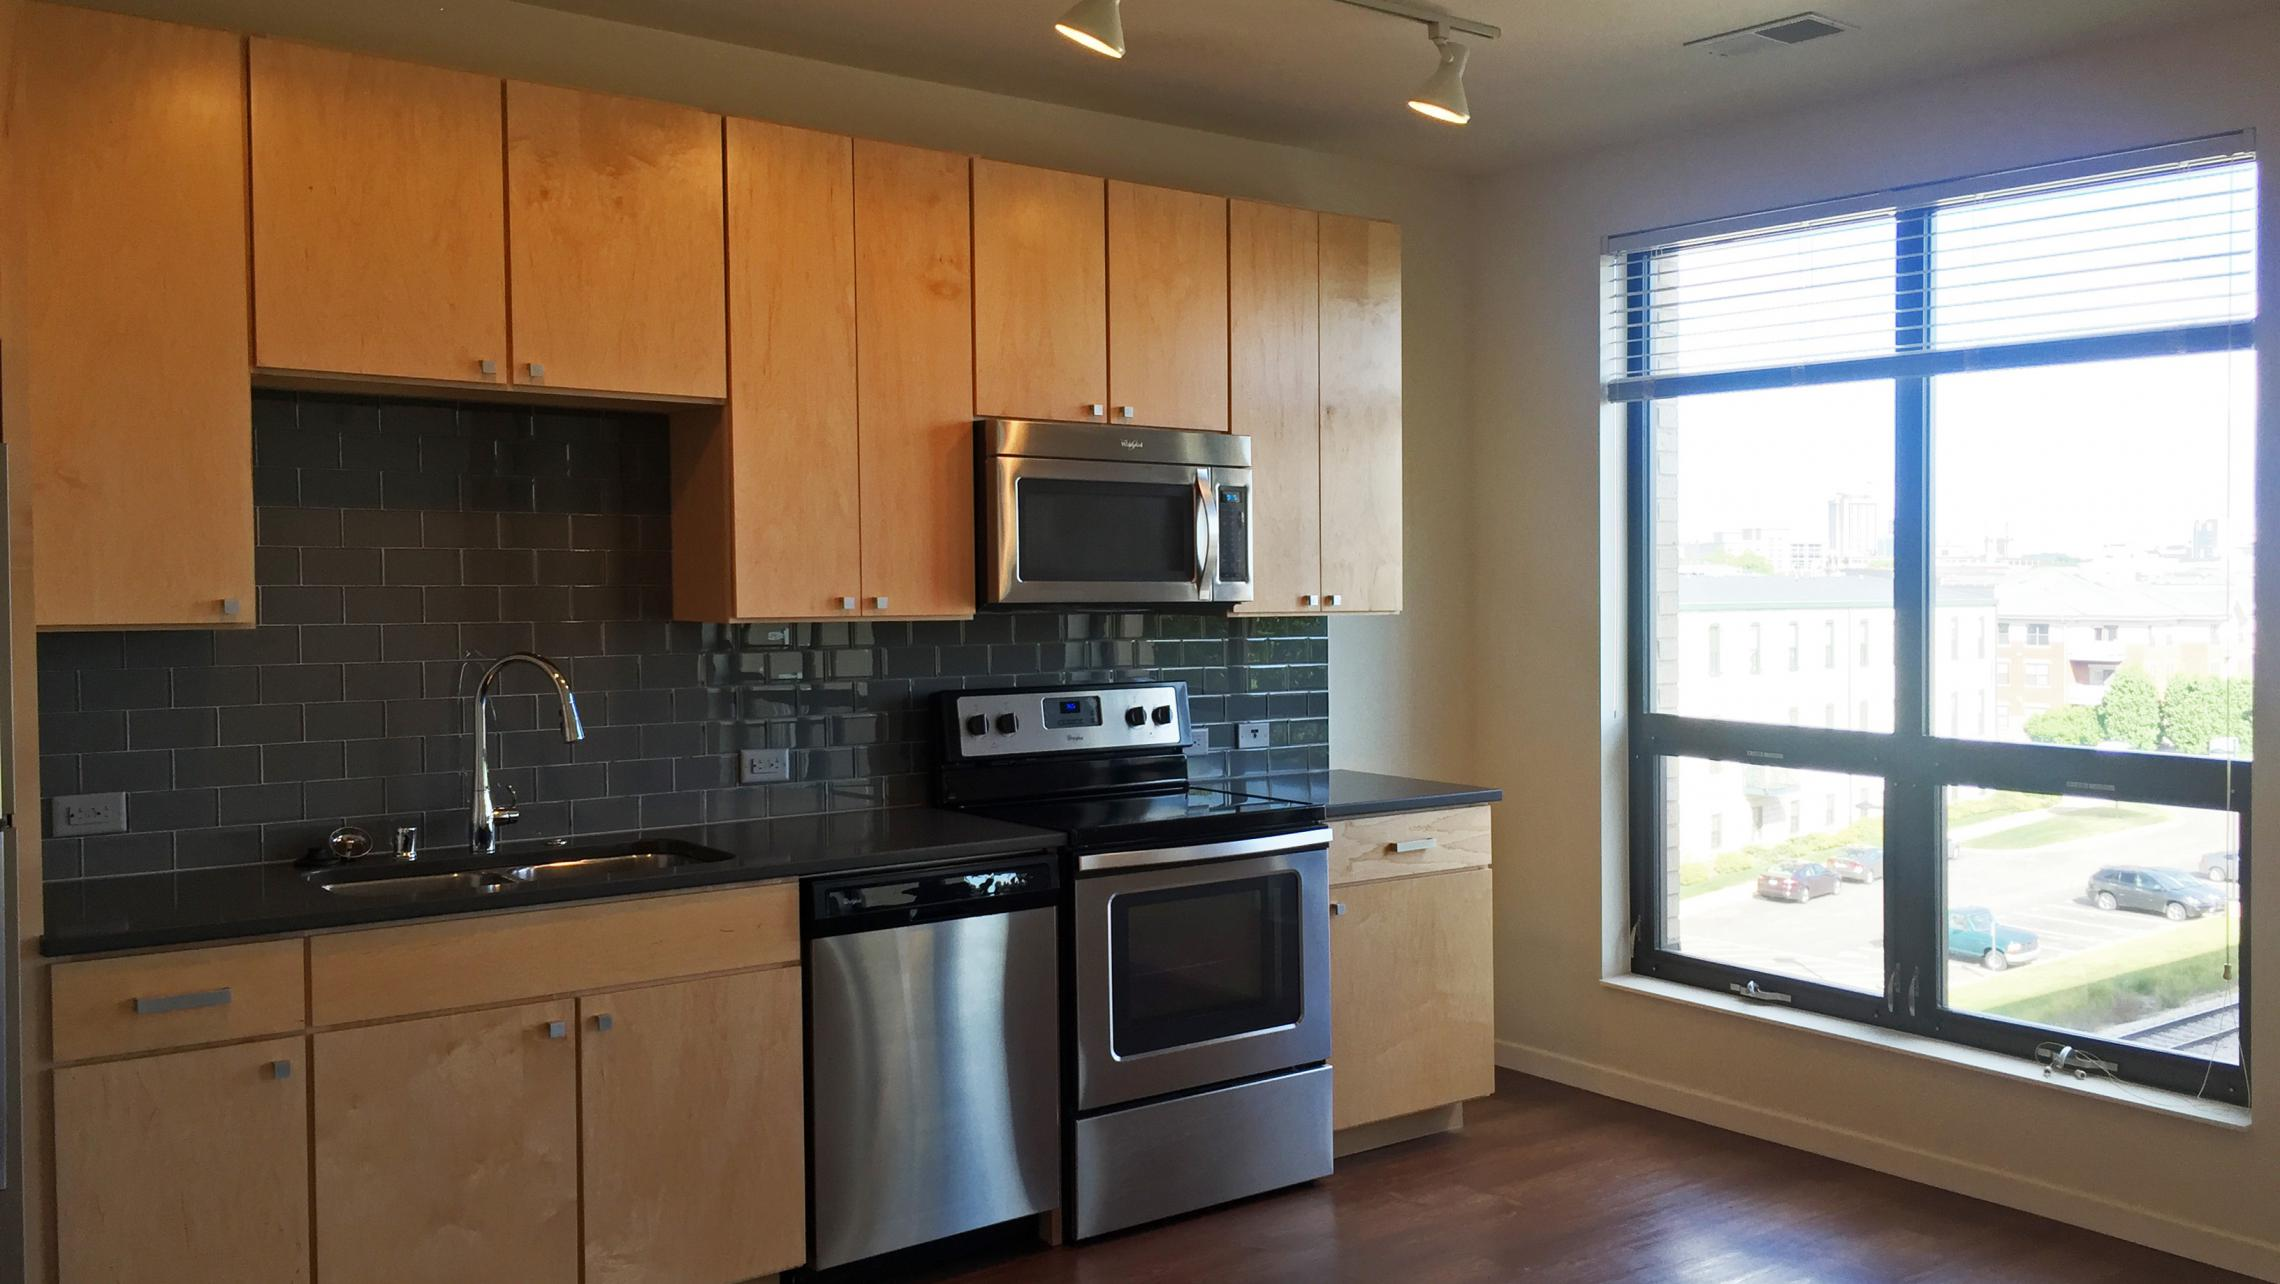 ULI Nine Line Apartment 212 - Kitchen with Natural Light